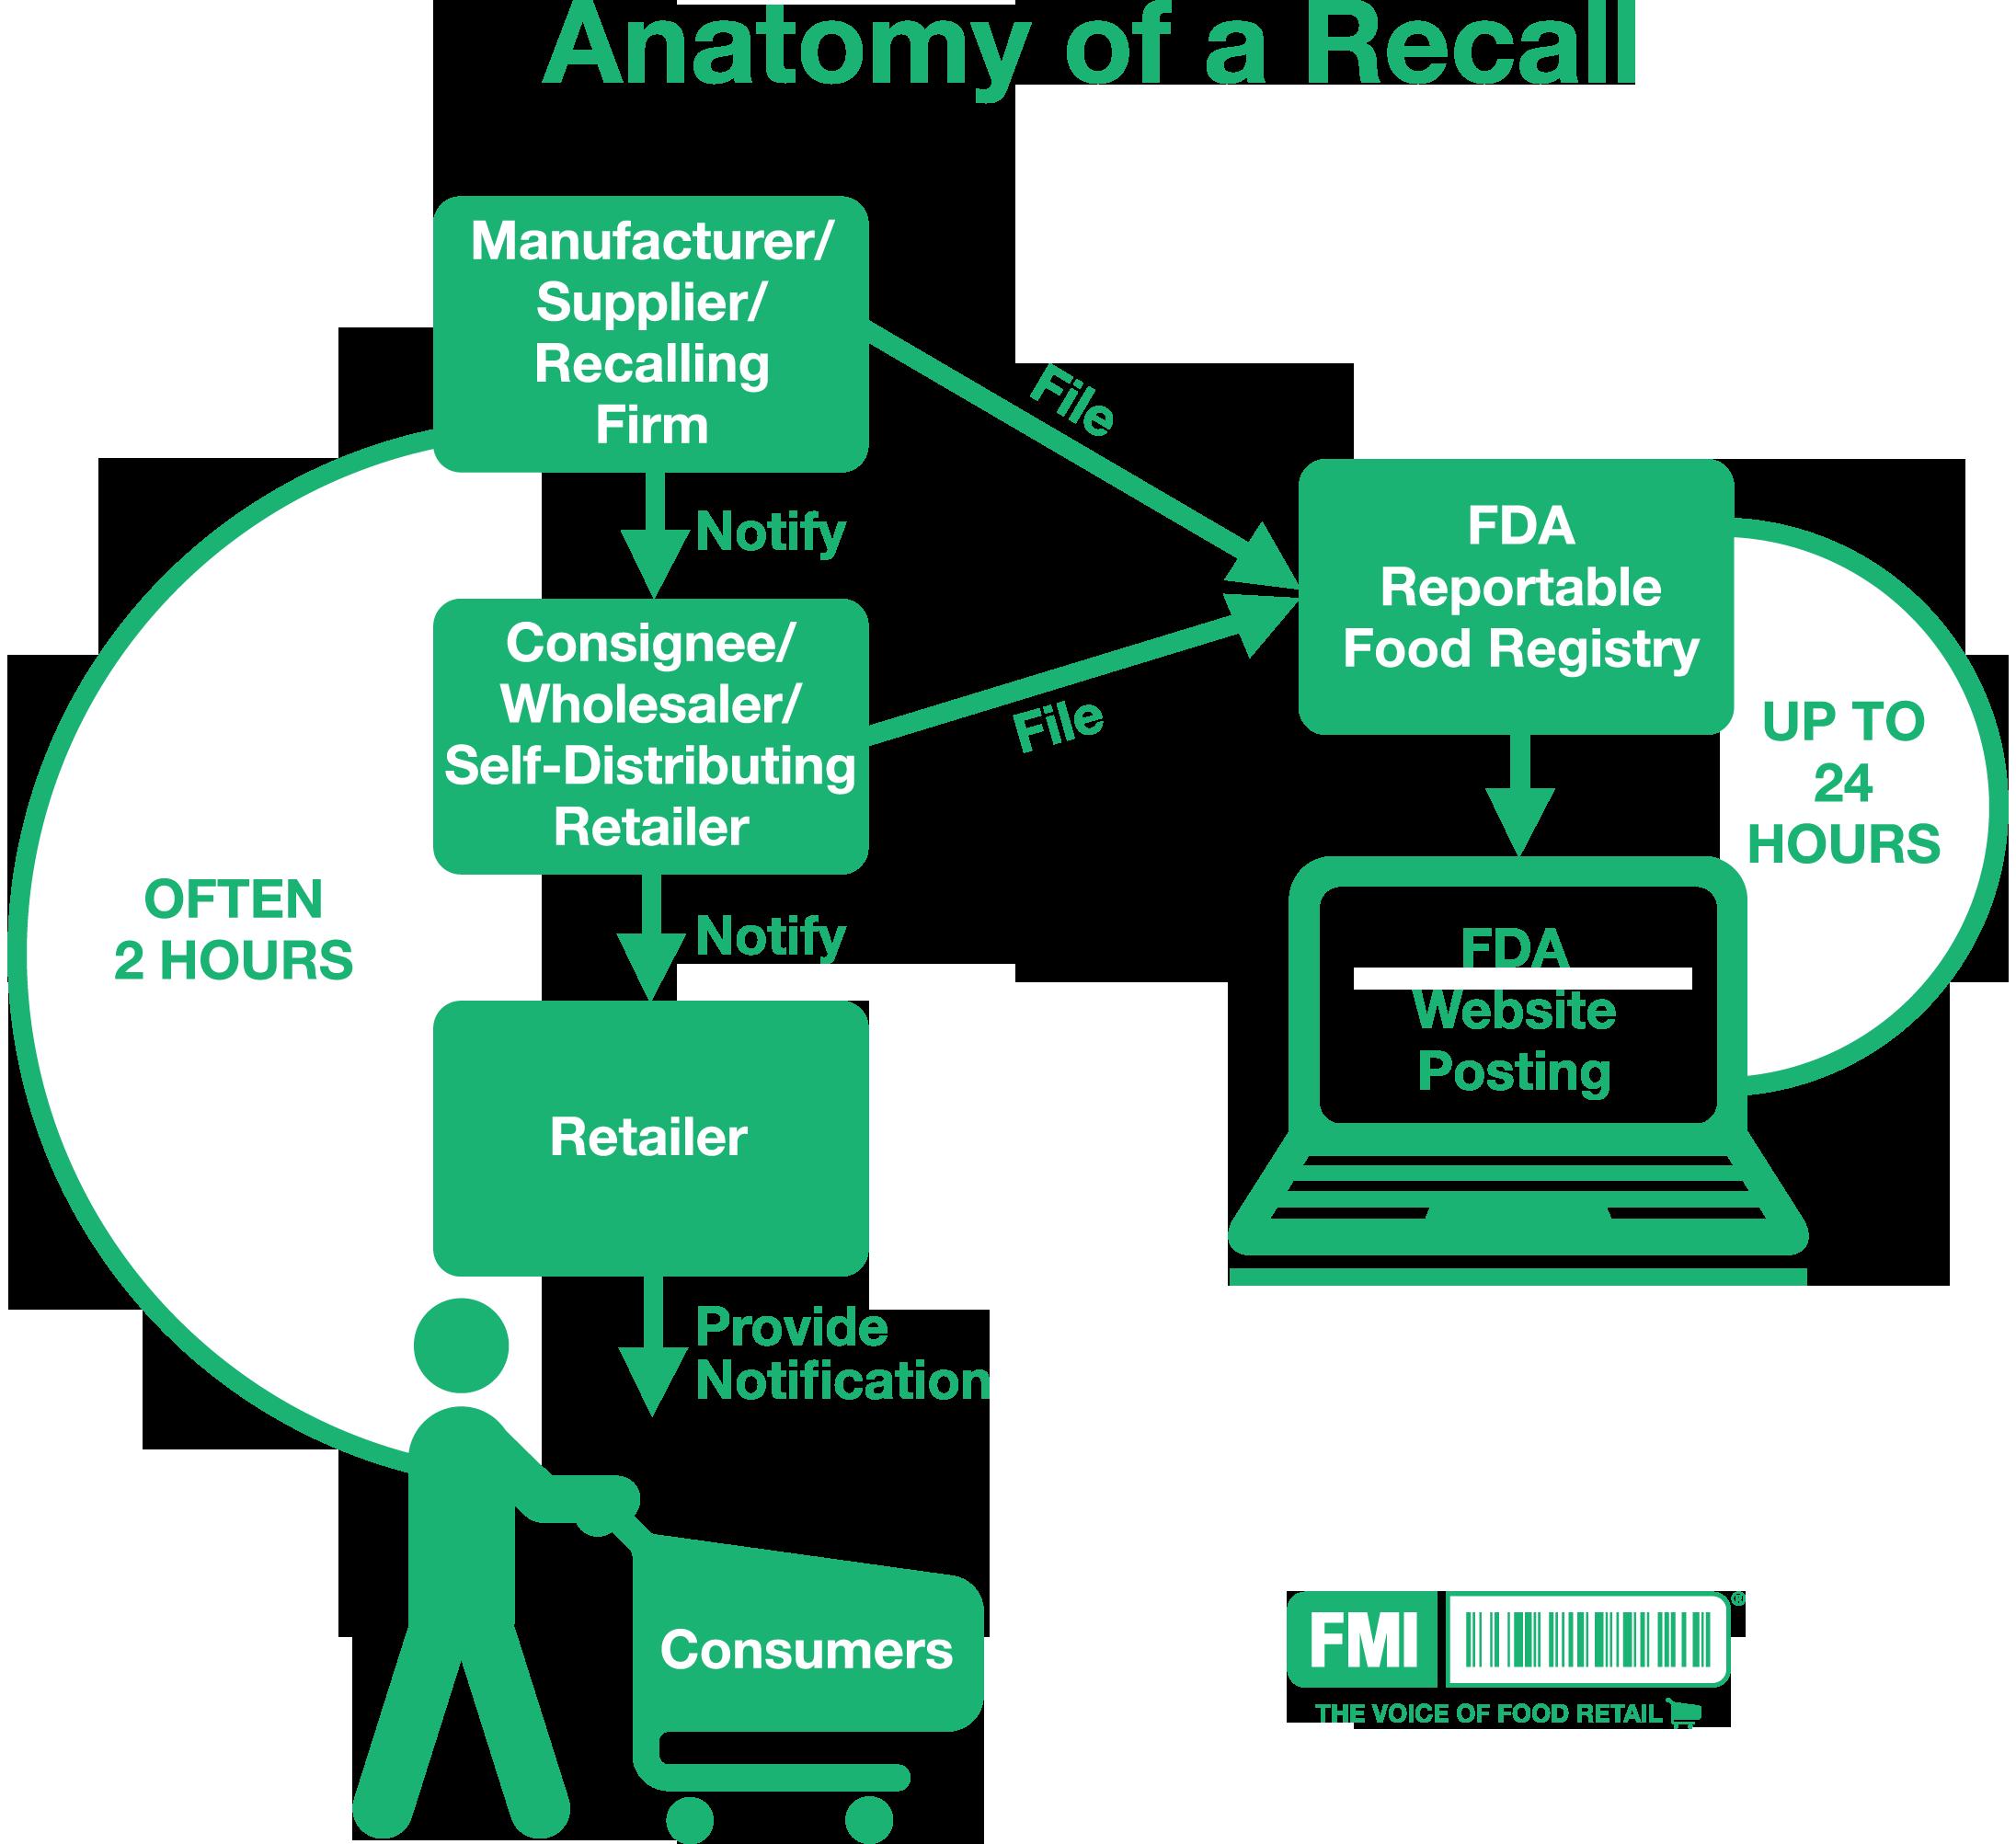 Fmi Food Marketing Institute Recalls